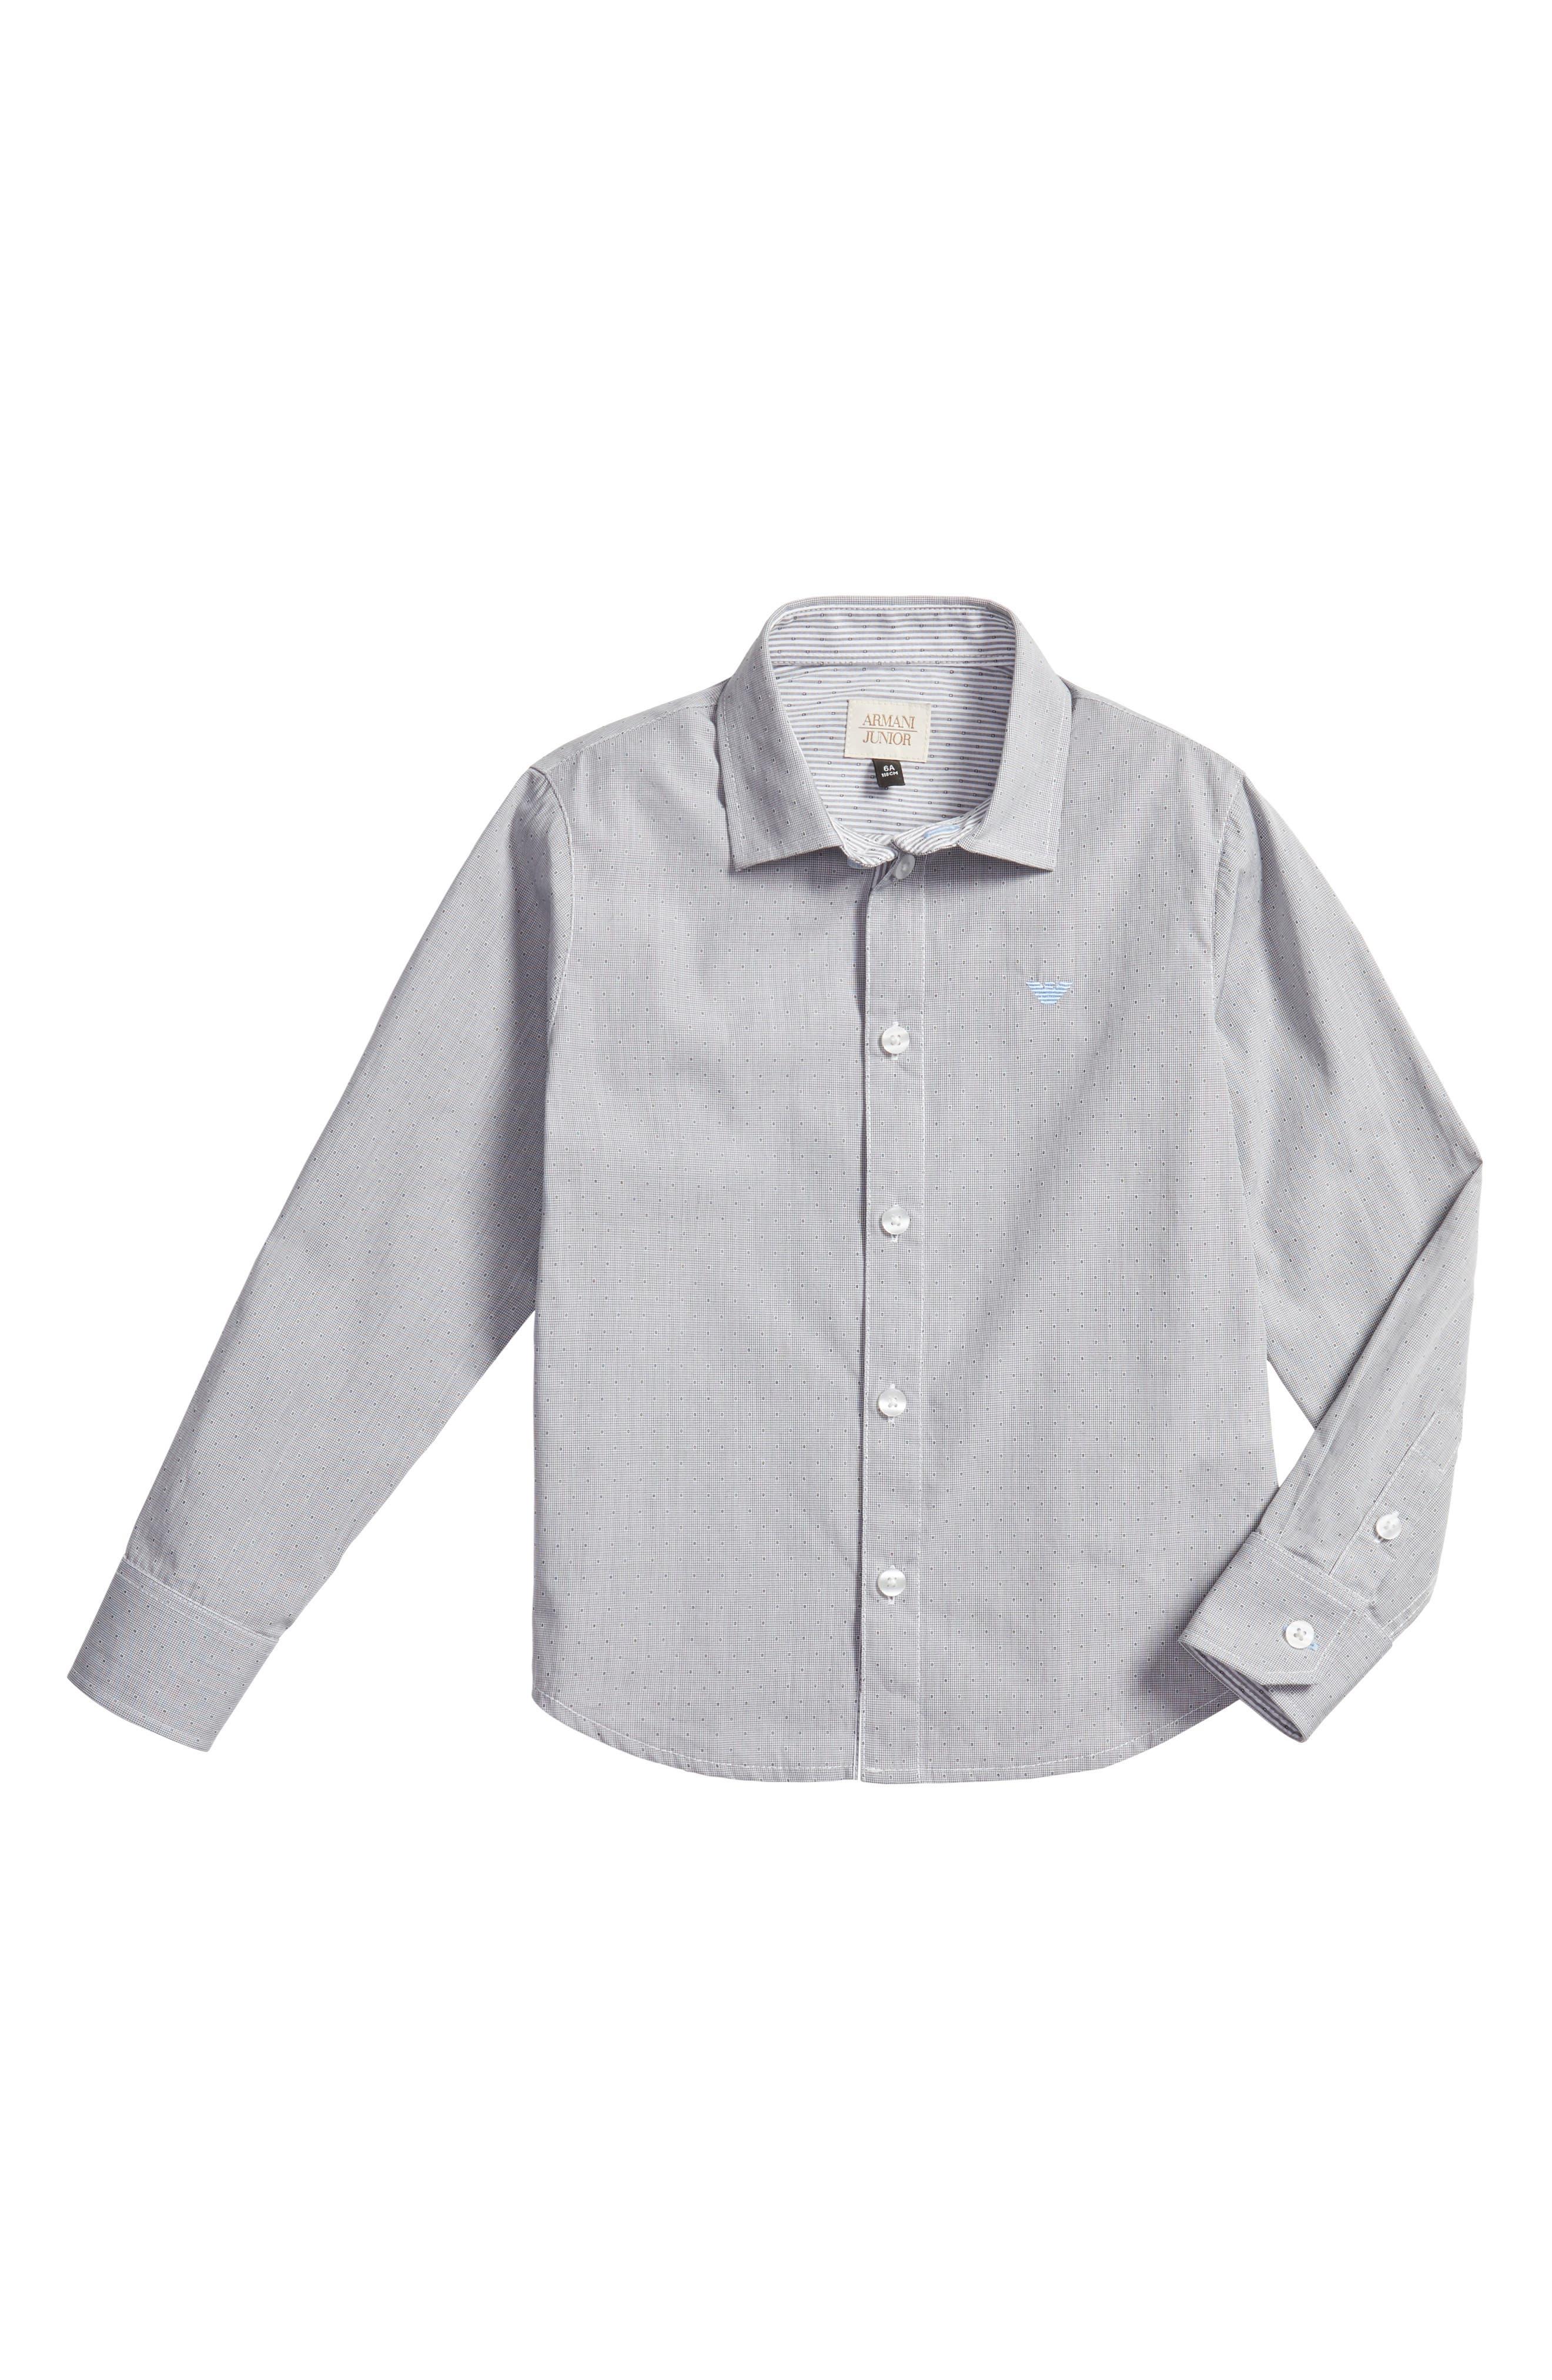 Main Image - Armani Junior Stripe Dress Shirt (Little Boys & Big Boys)